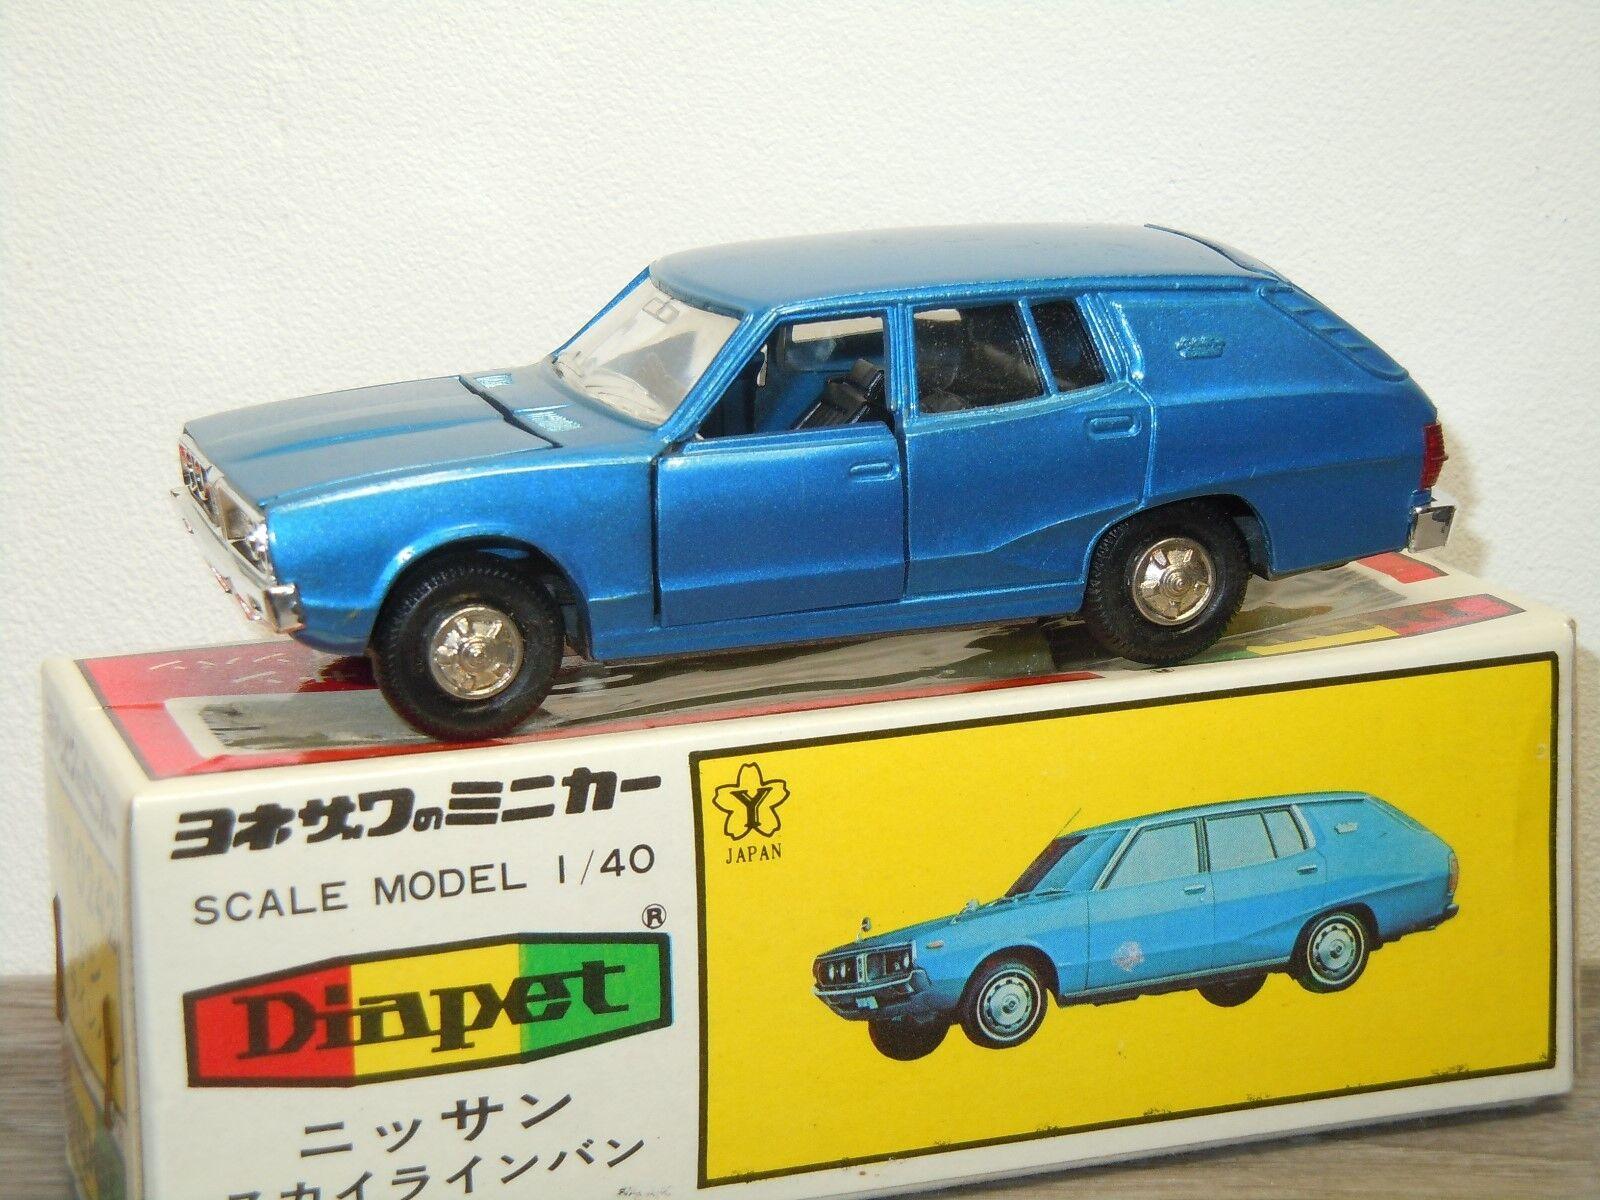 Nissan skyline van - diapet yoneazawa spielzeug 0242 japan 1  40 im kasten  33030